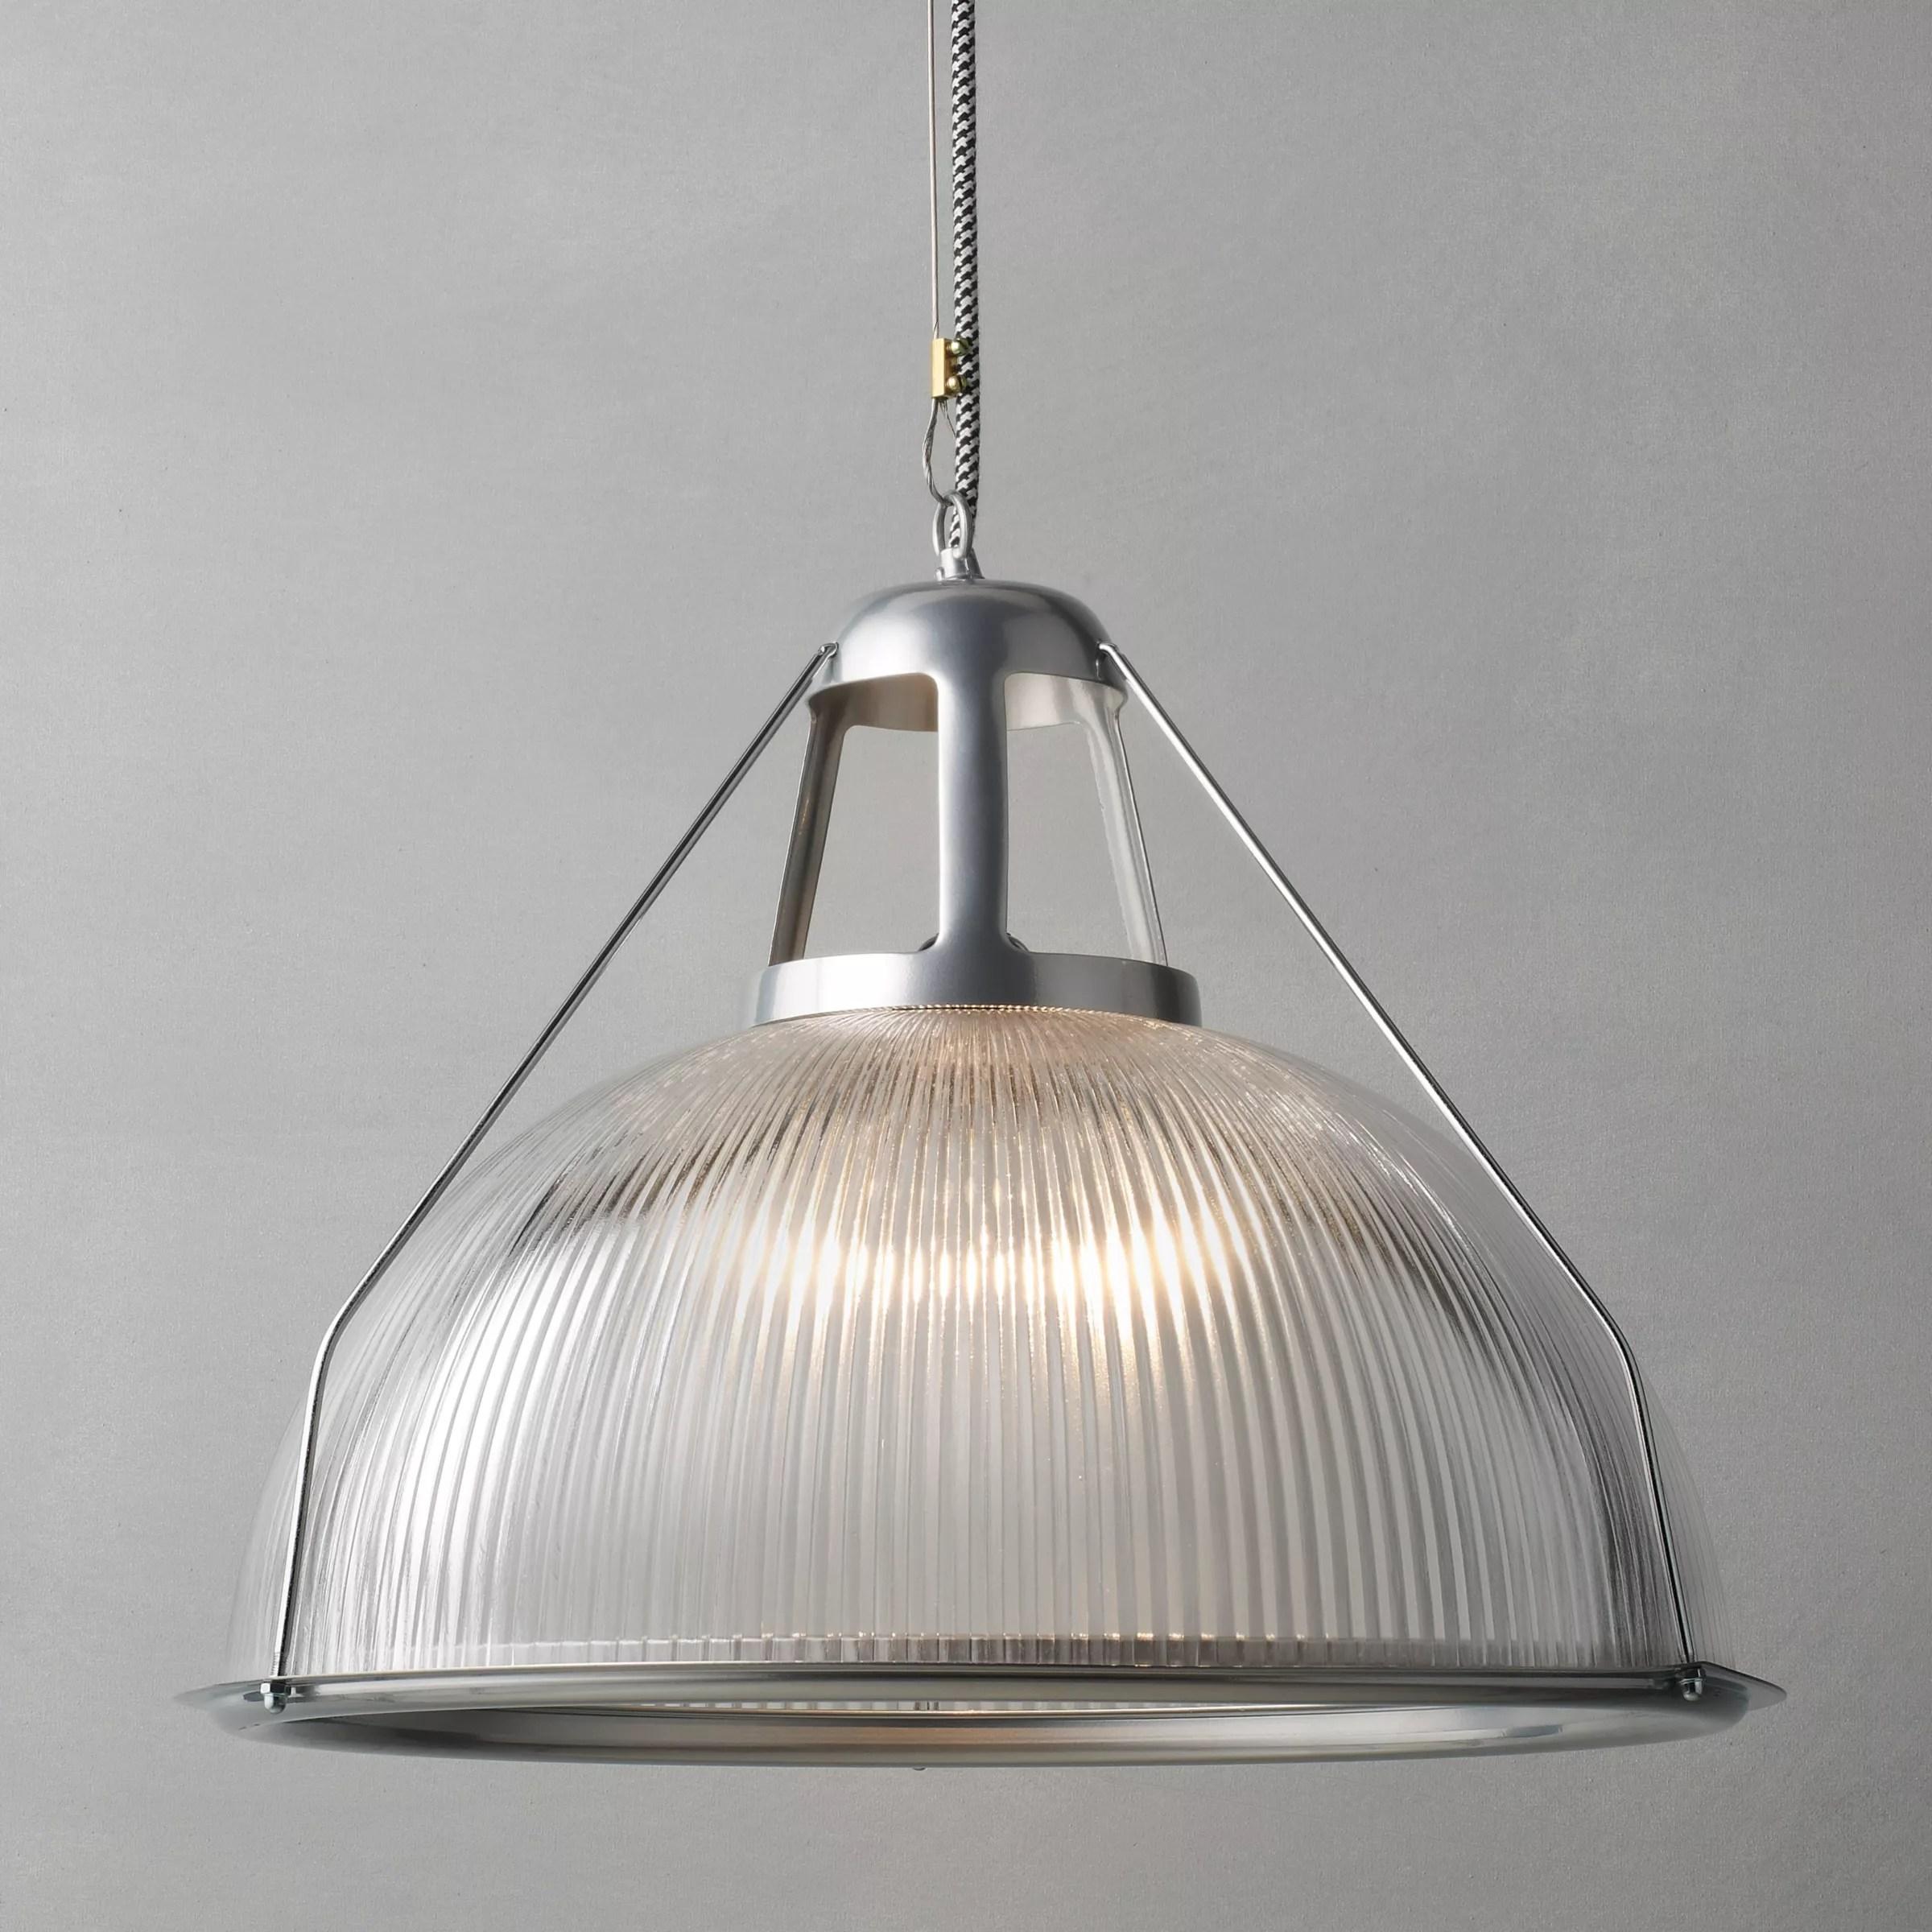 kitchen overhead lights table sizes ceiling john lewis partners original btc phane light large